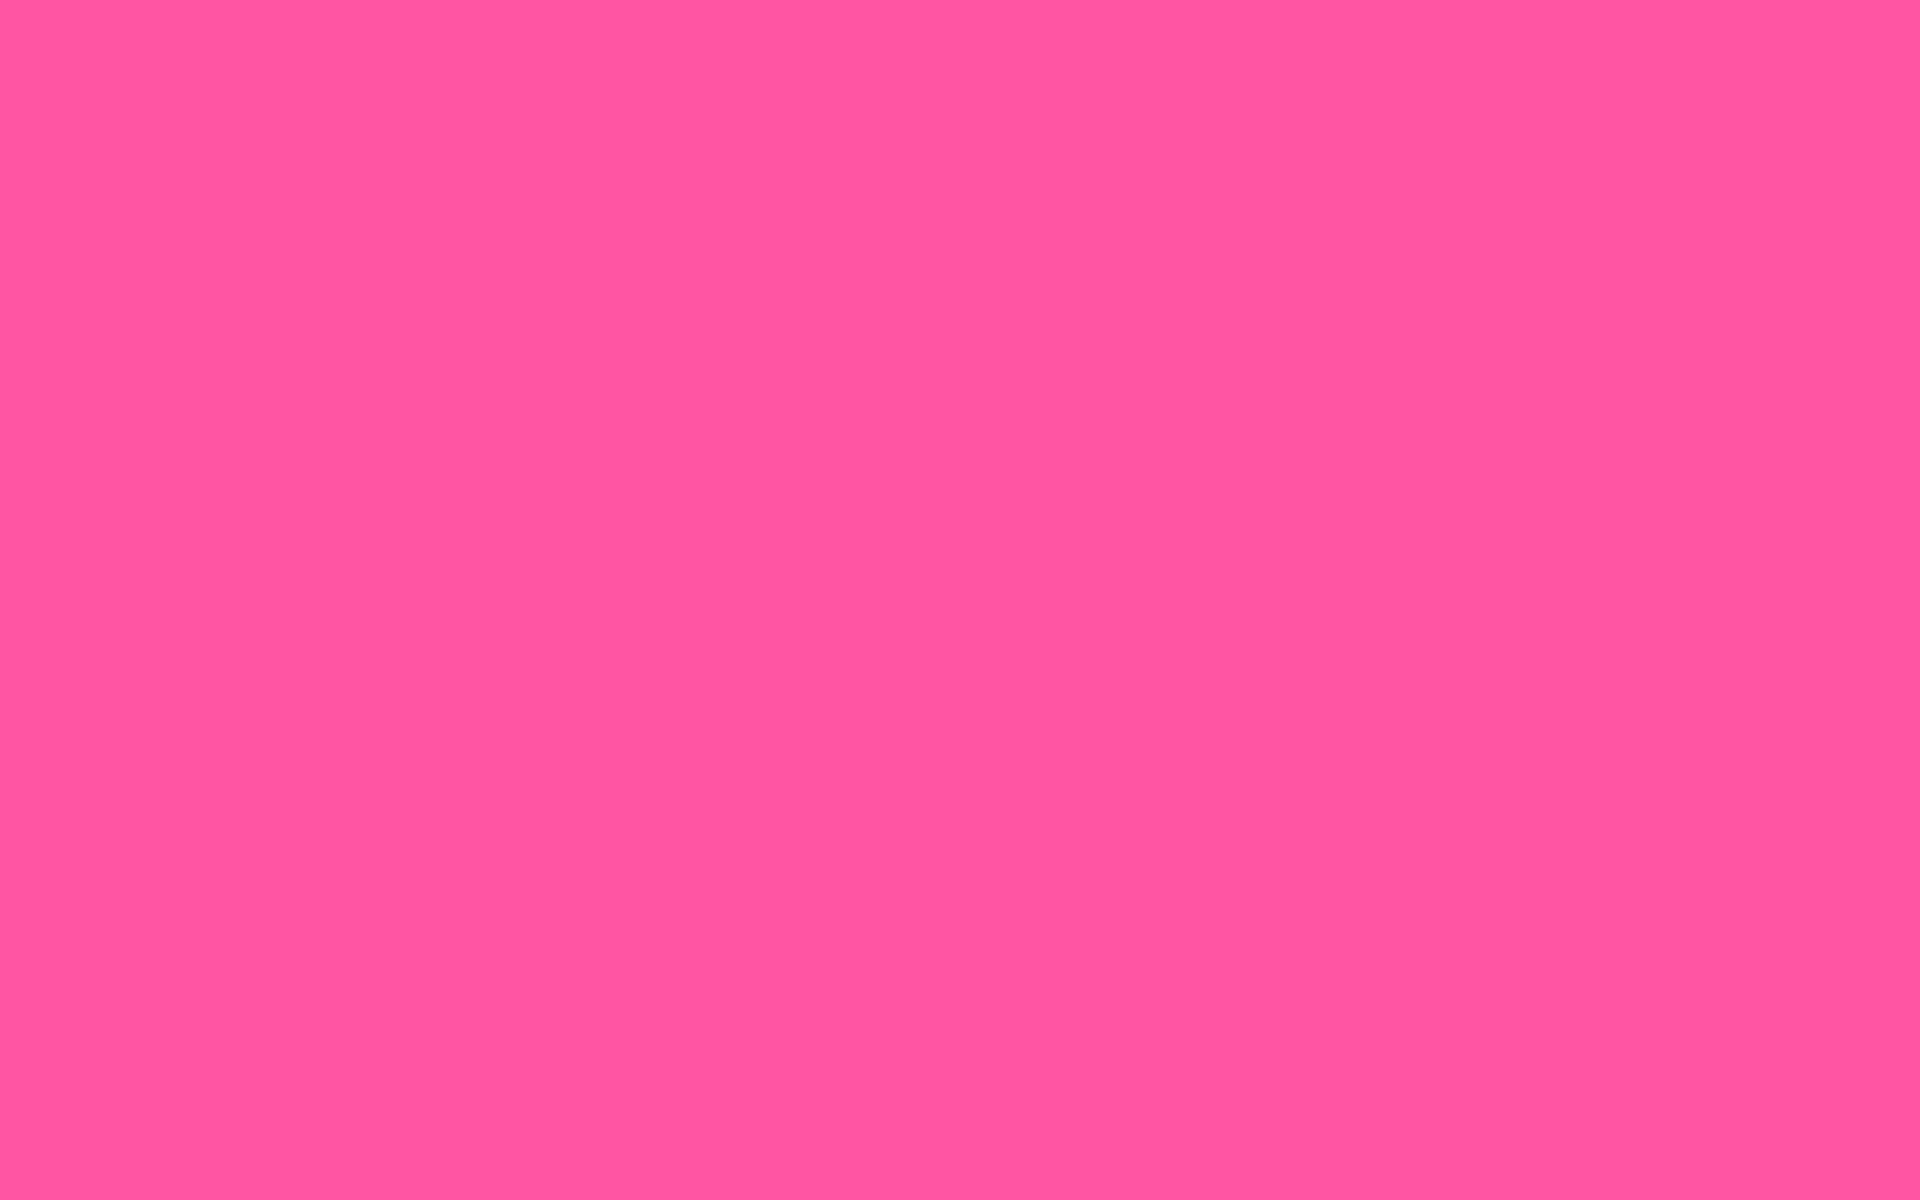 1920x1200 Brilliant Rose Solid Color Background